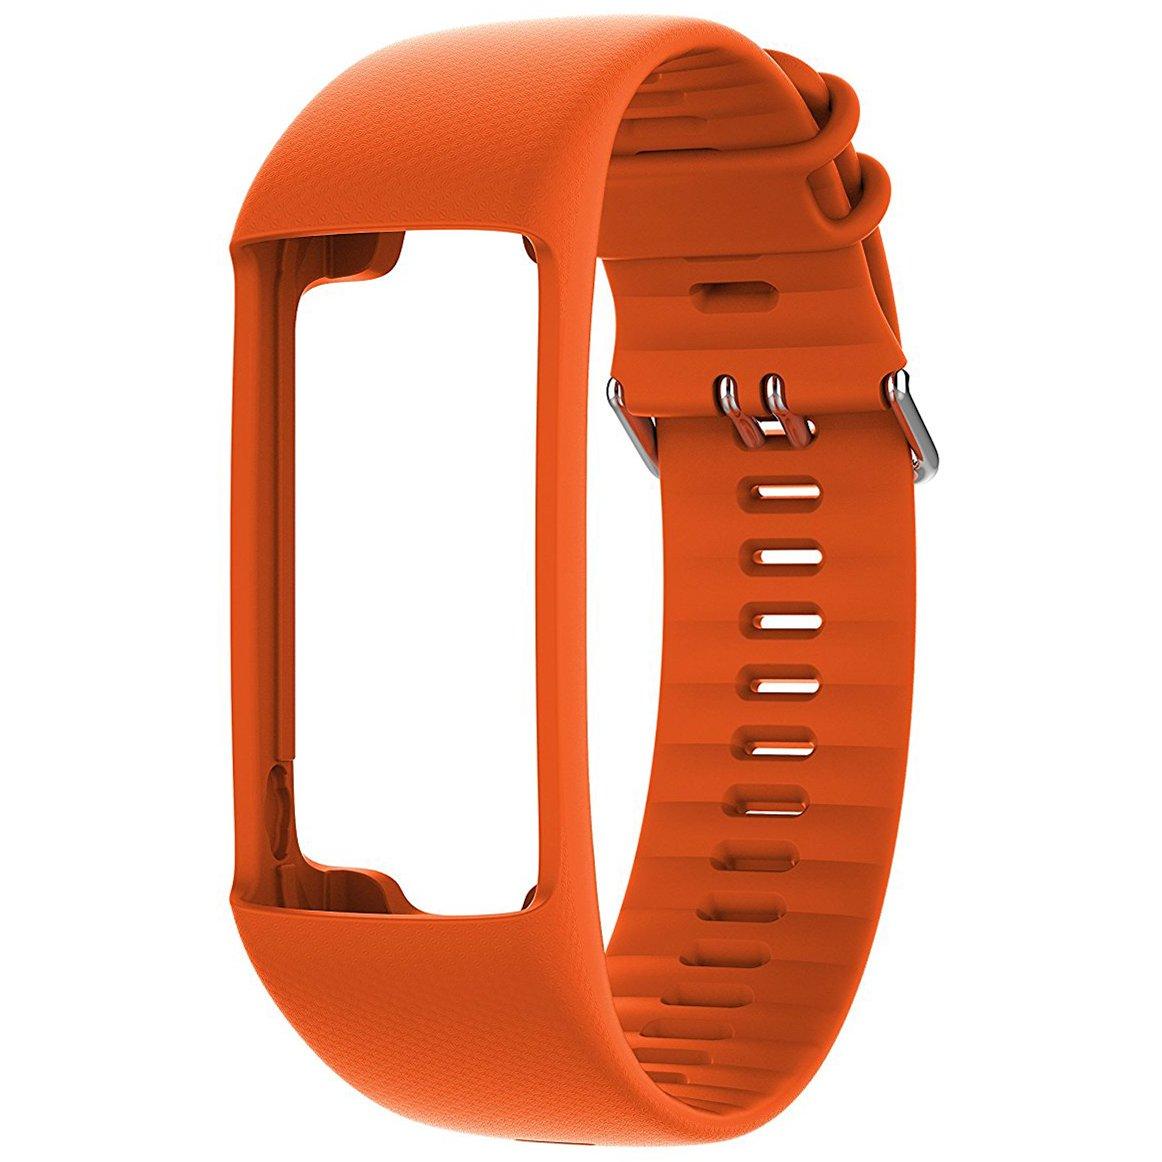 Polar Wrist Strap A370 Wechselarmband weiß M/L 91064884